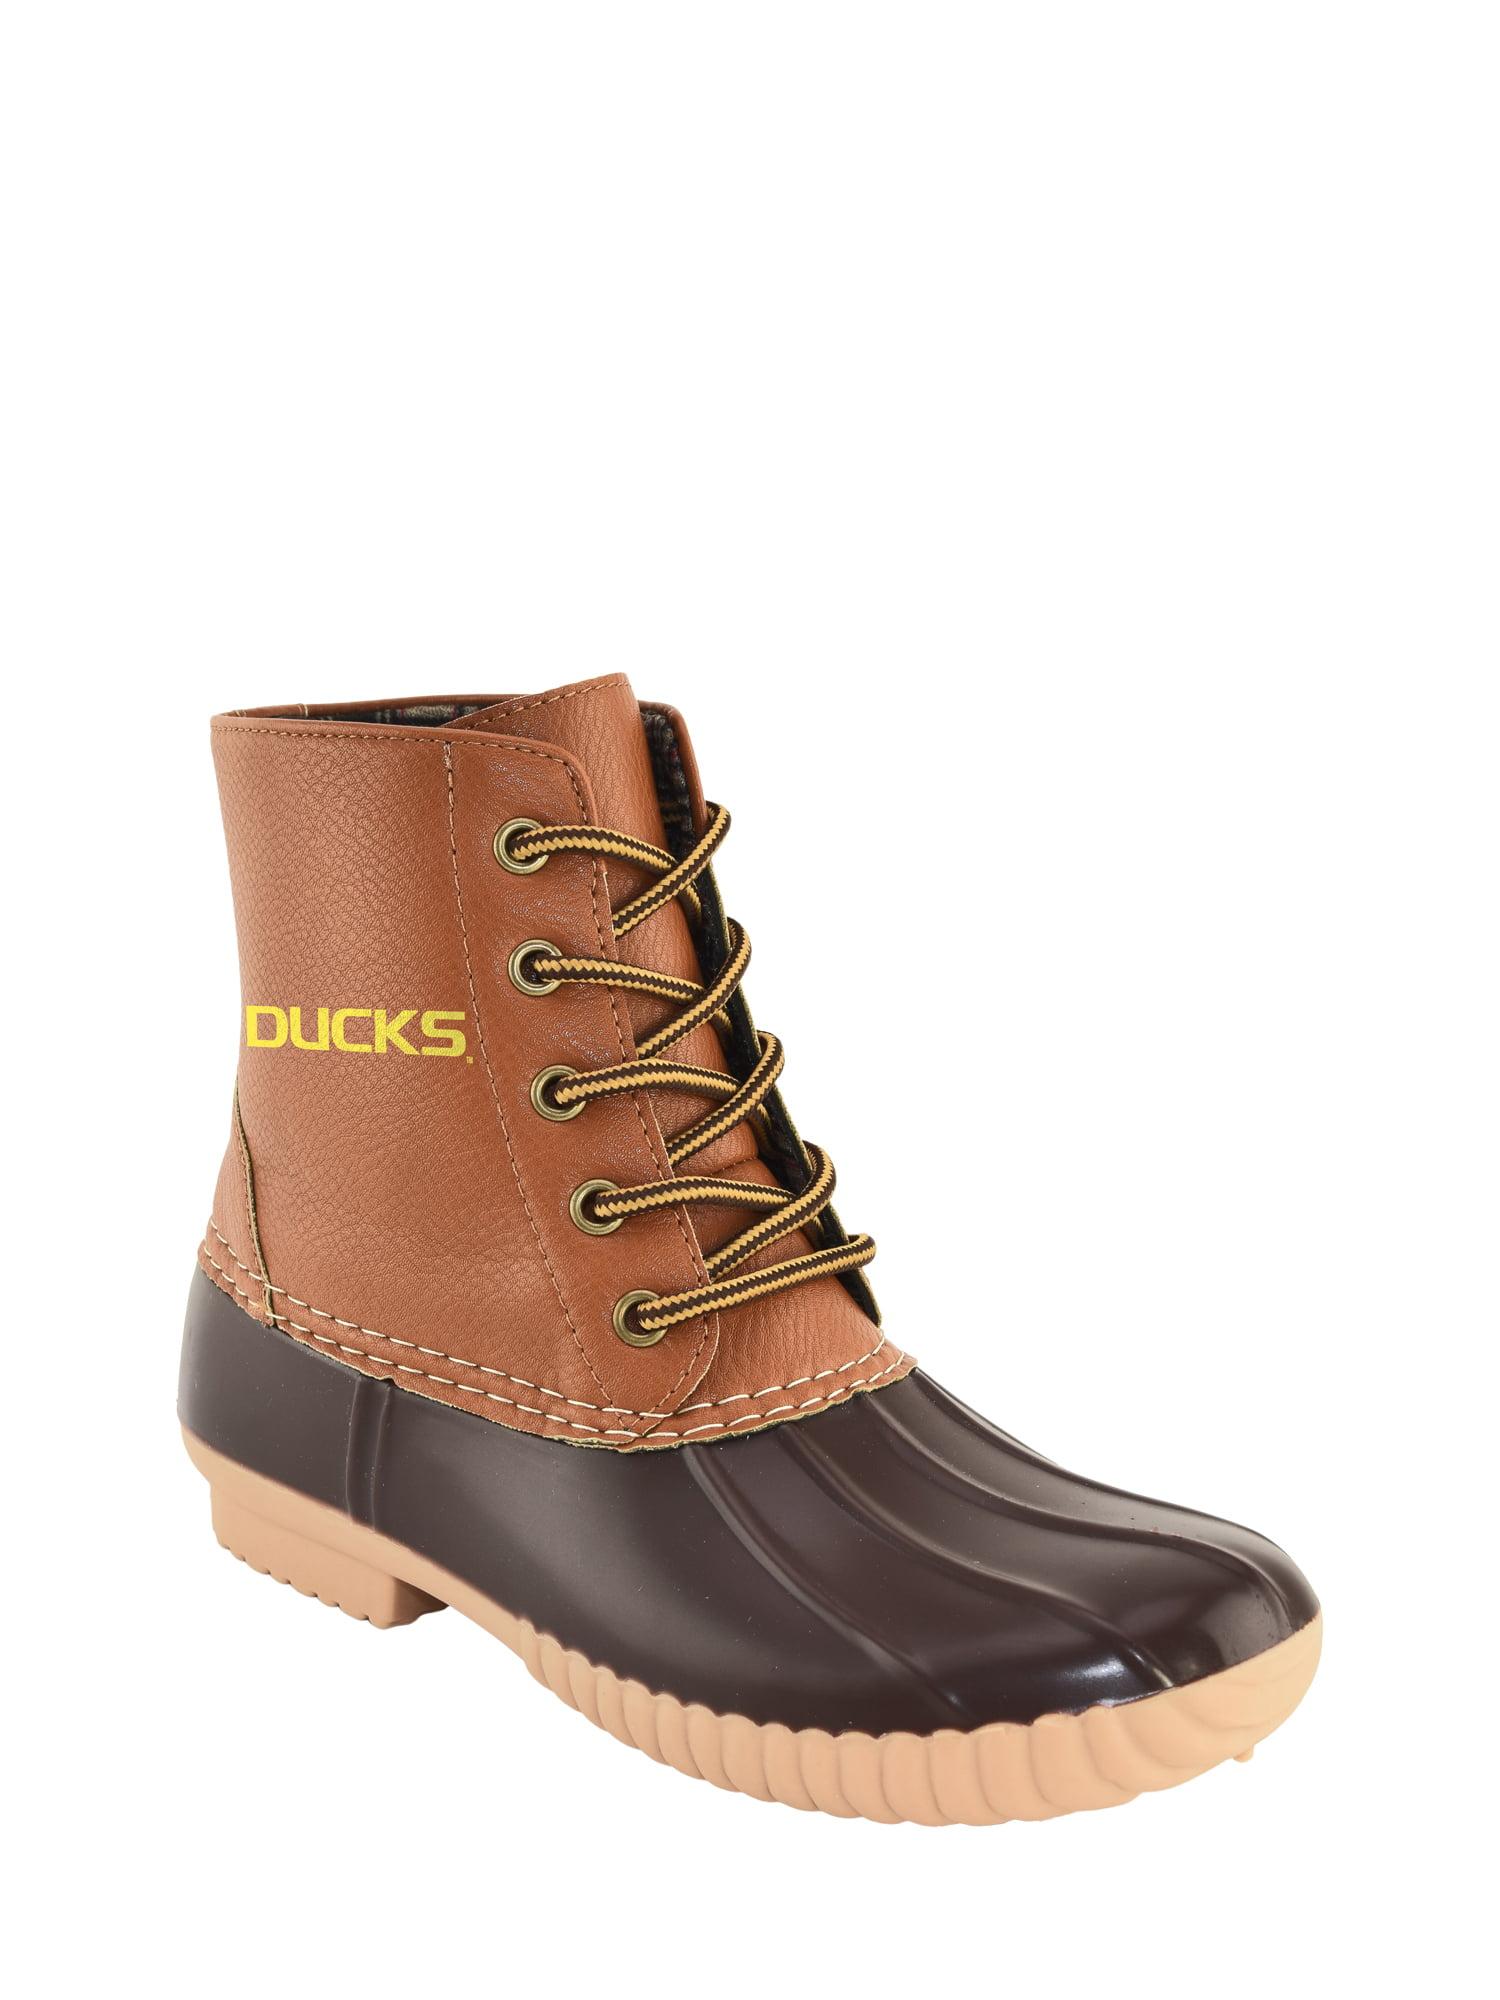 NCAA Women's Oregon -High Duck Boot by Jordache LTD